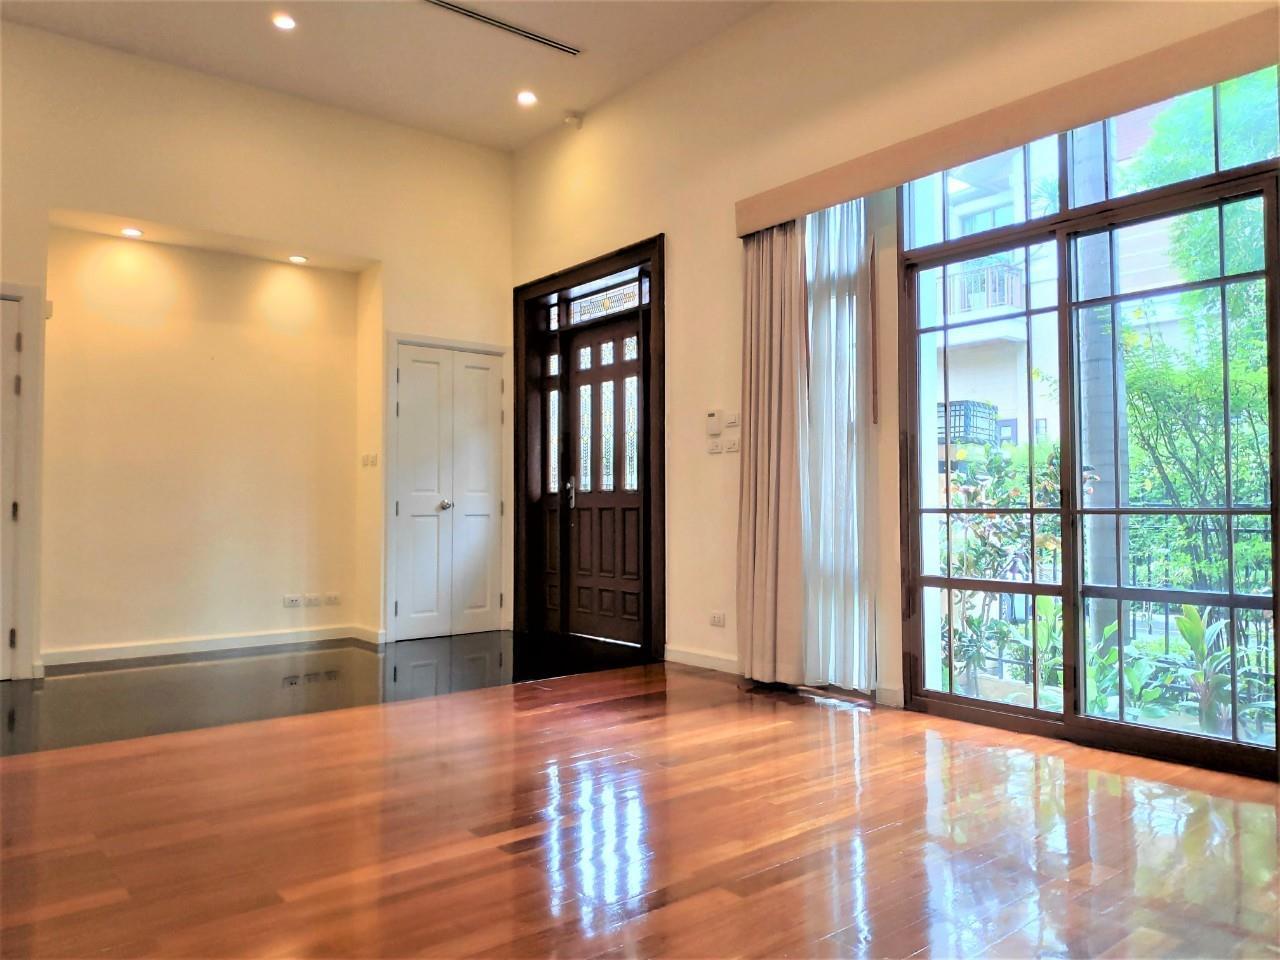 Agent - Natchga Boonkrong  Agency's For Rent House 4 Bedrooms Baan Sansiri Sukhumvit 67 5